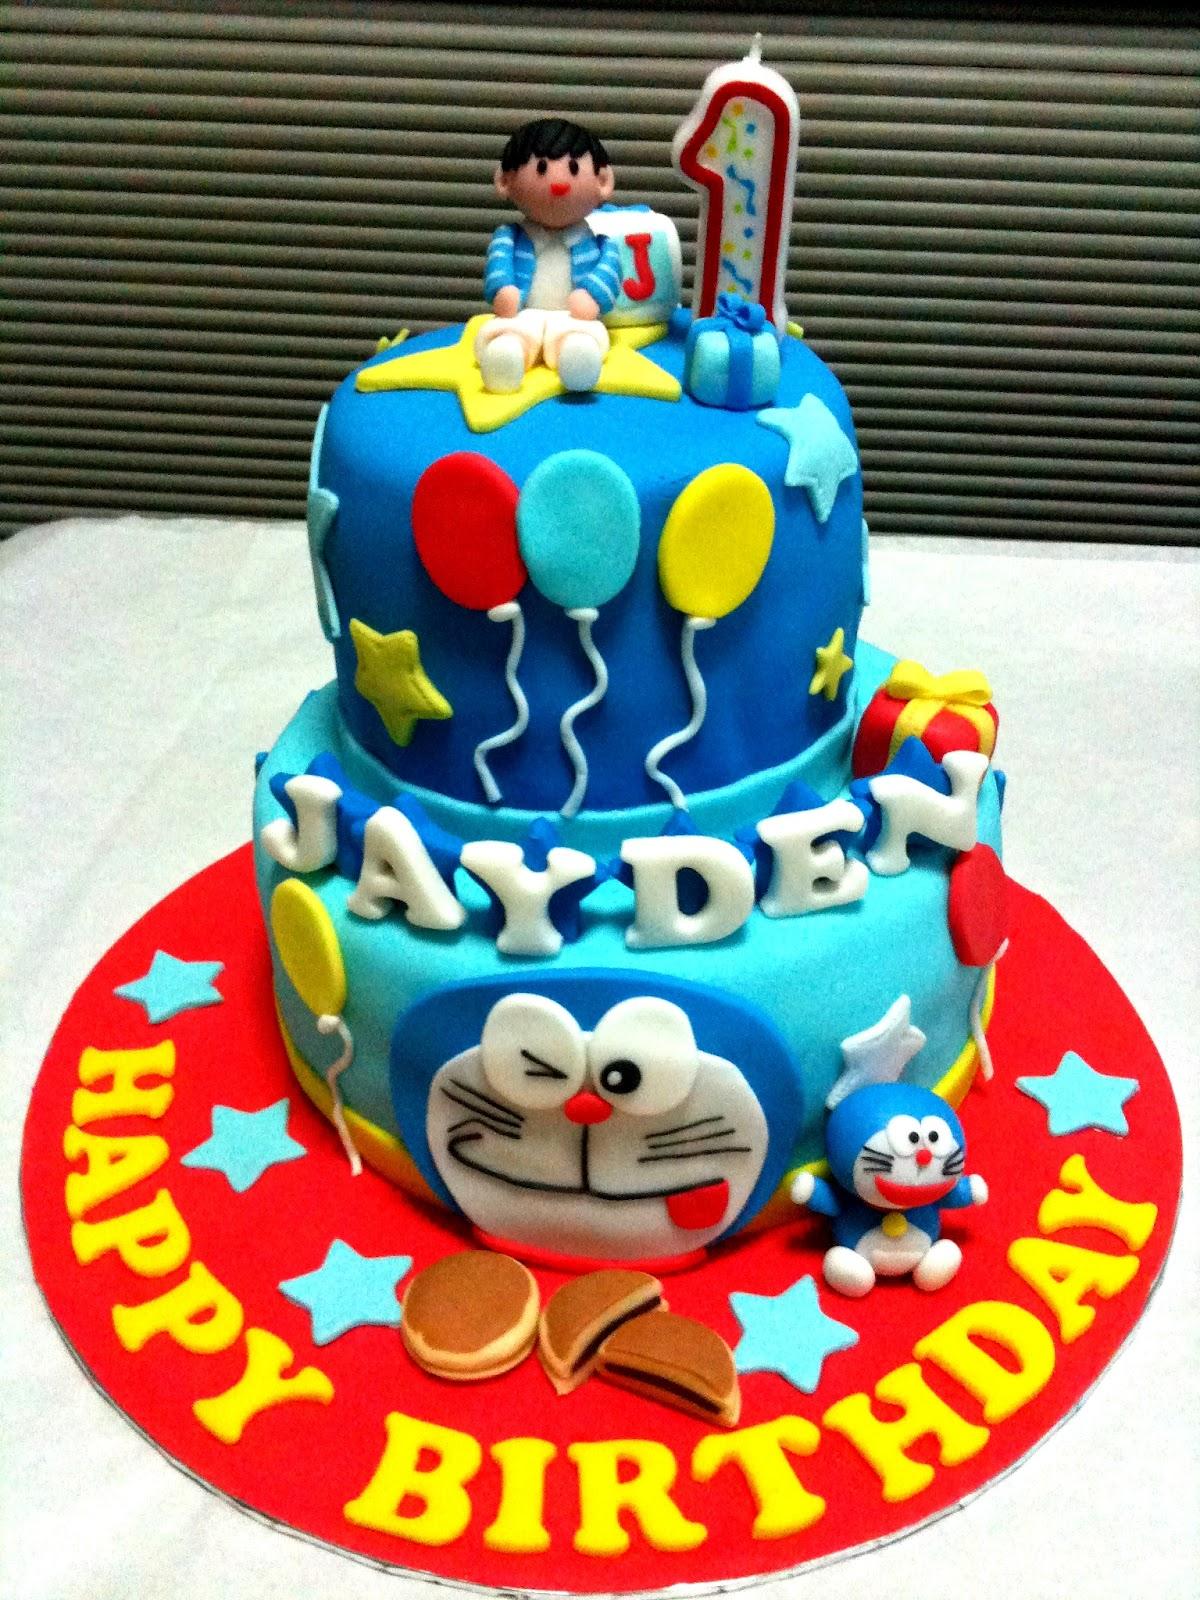 Birthday Cake Images Of Doraemon ~ Oven creations happy st birthday jayden